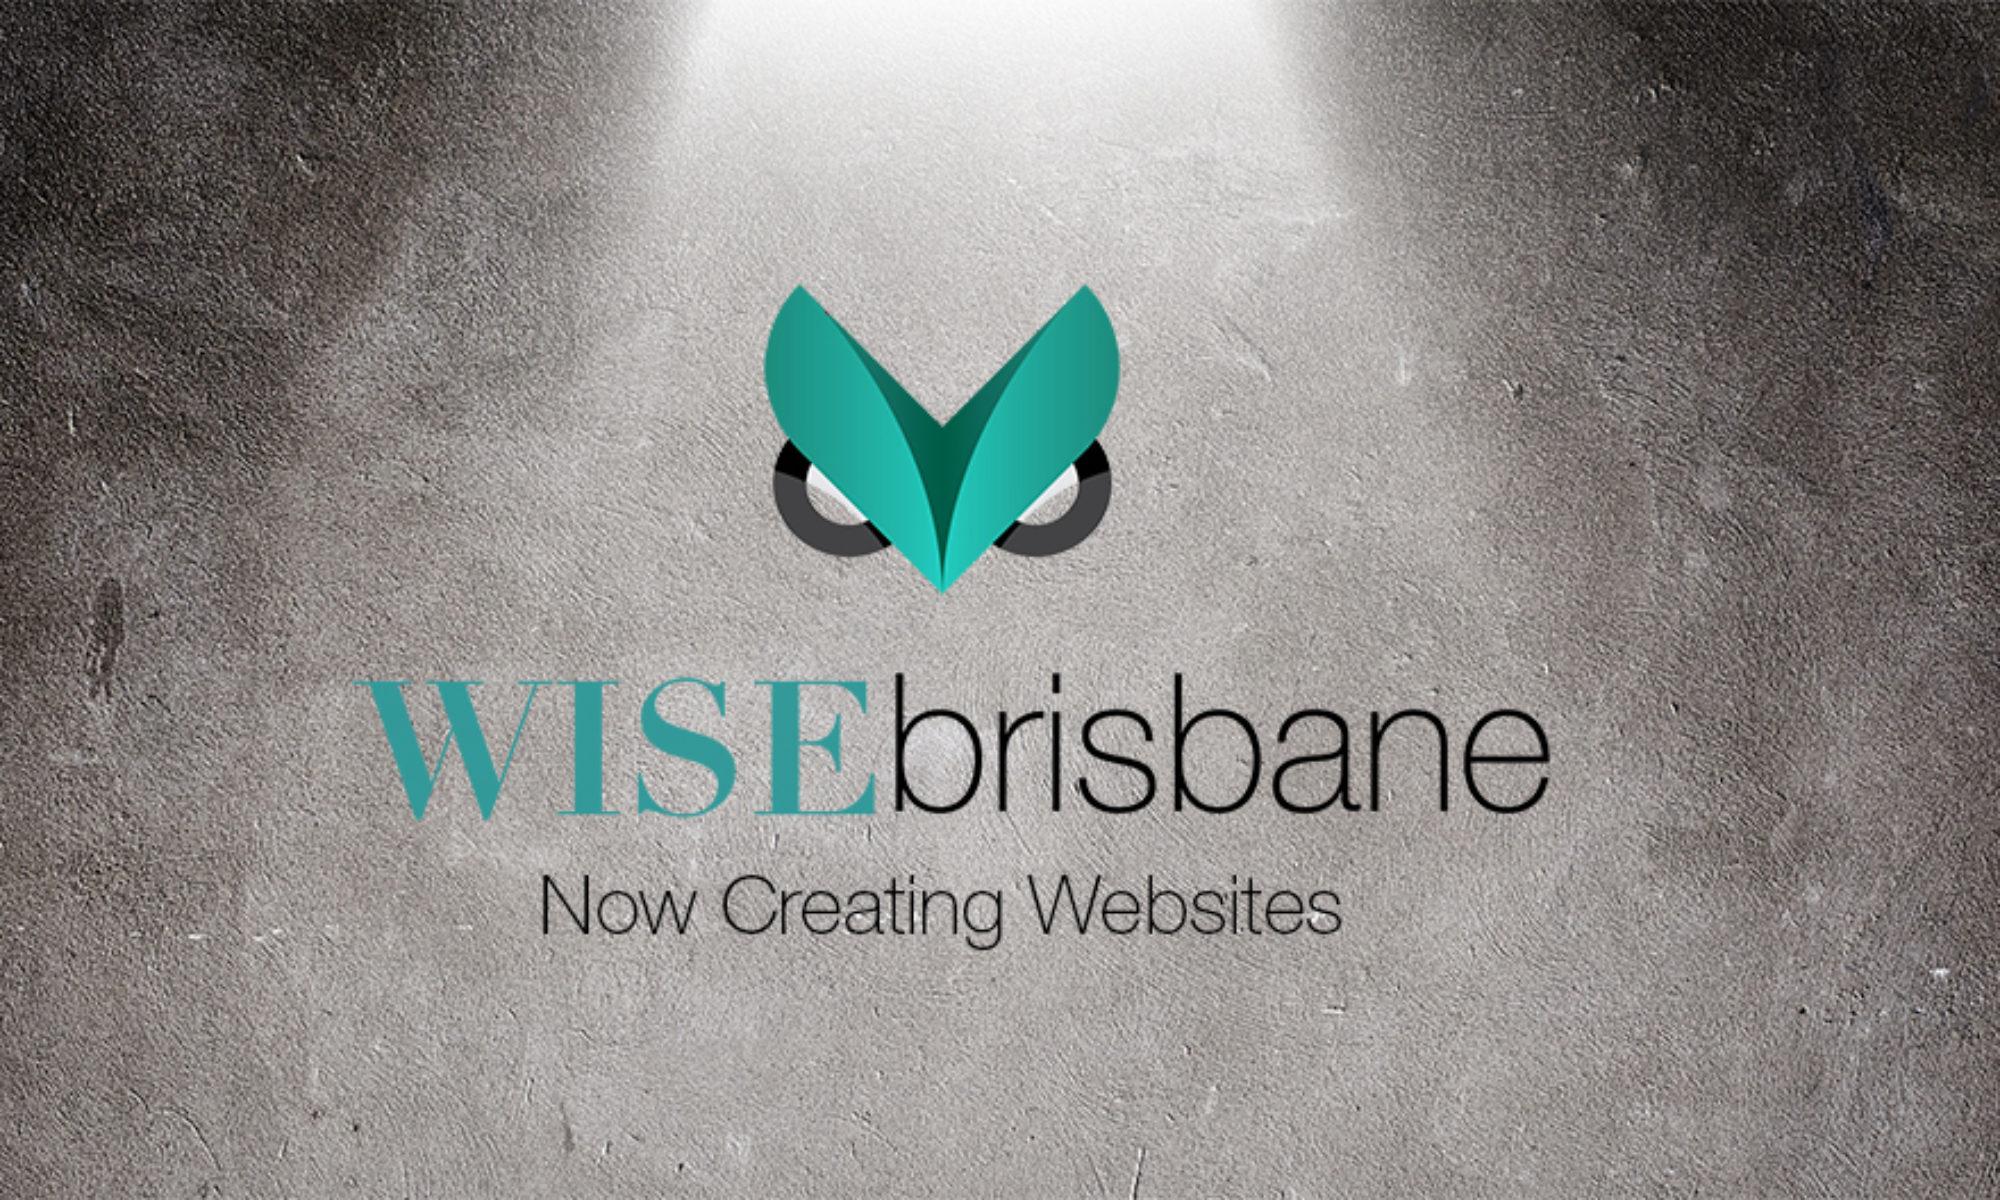 Wisebrisbane